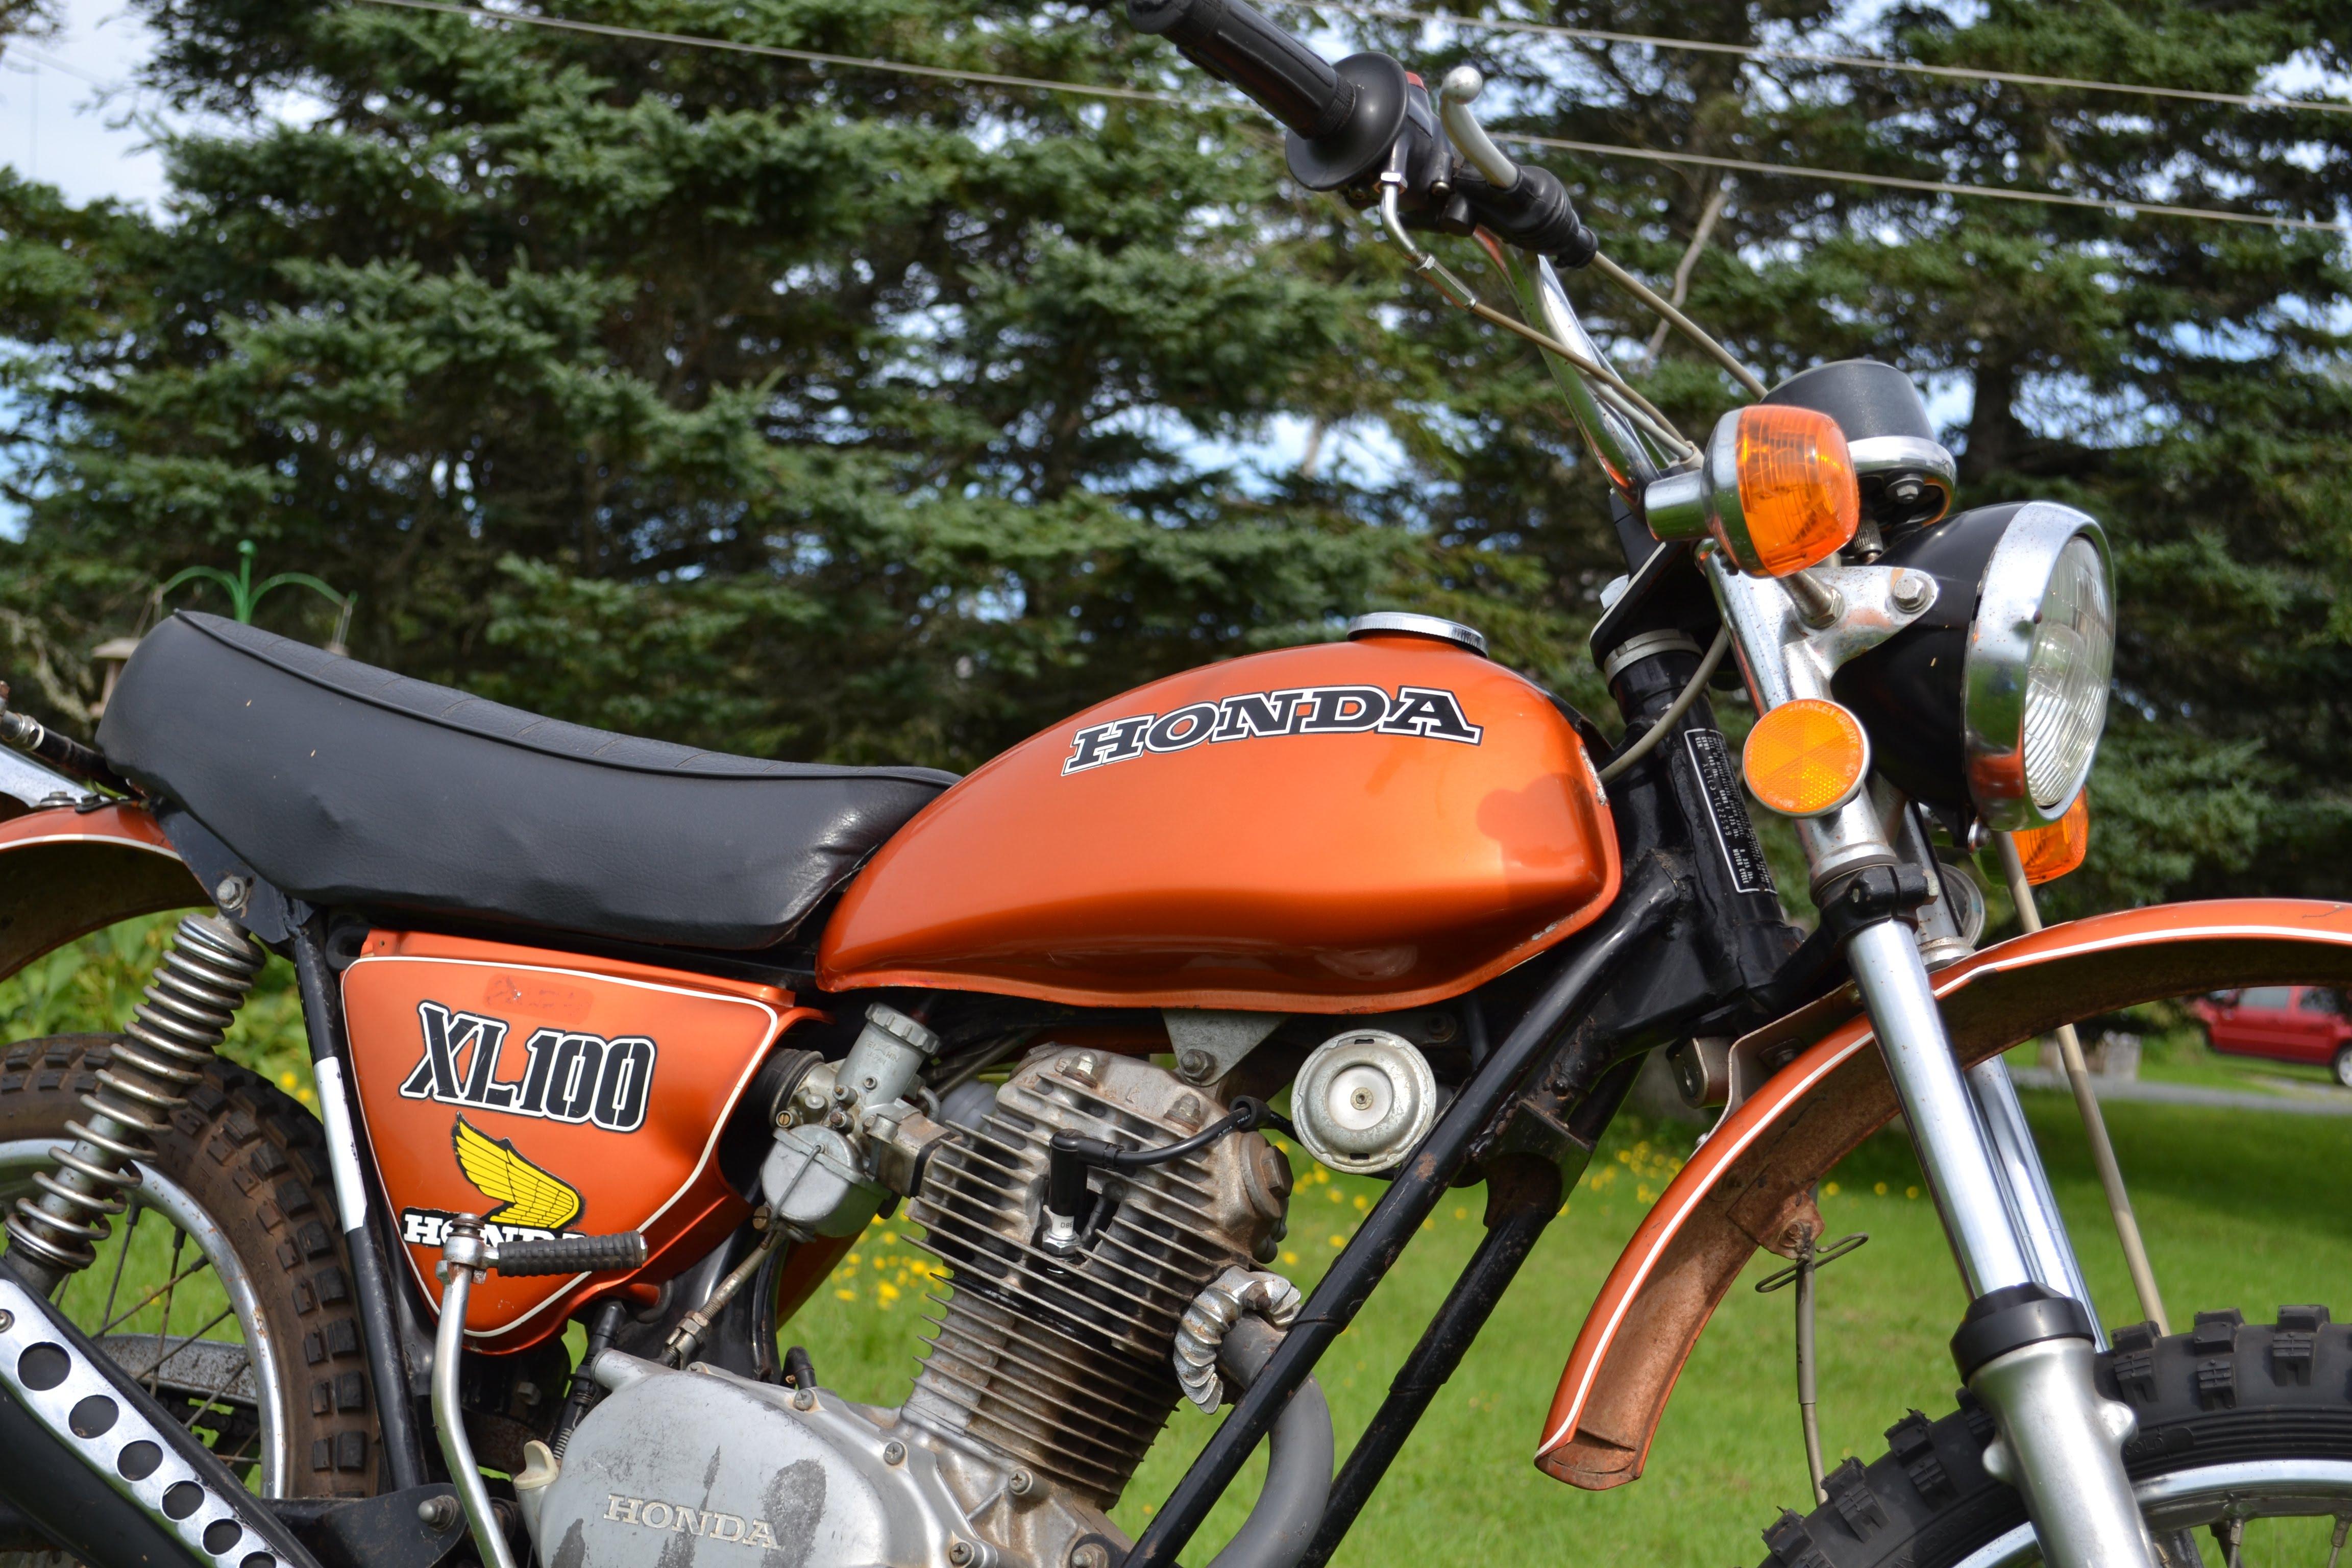 1974 Honda Xl 100 Wiring Diagram Free Download Diagrams 250 Home 28 At Moped